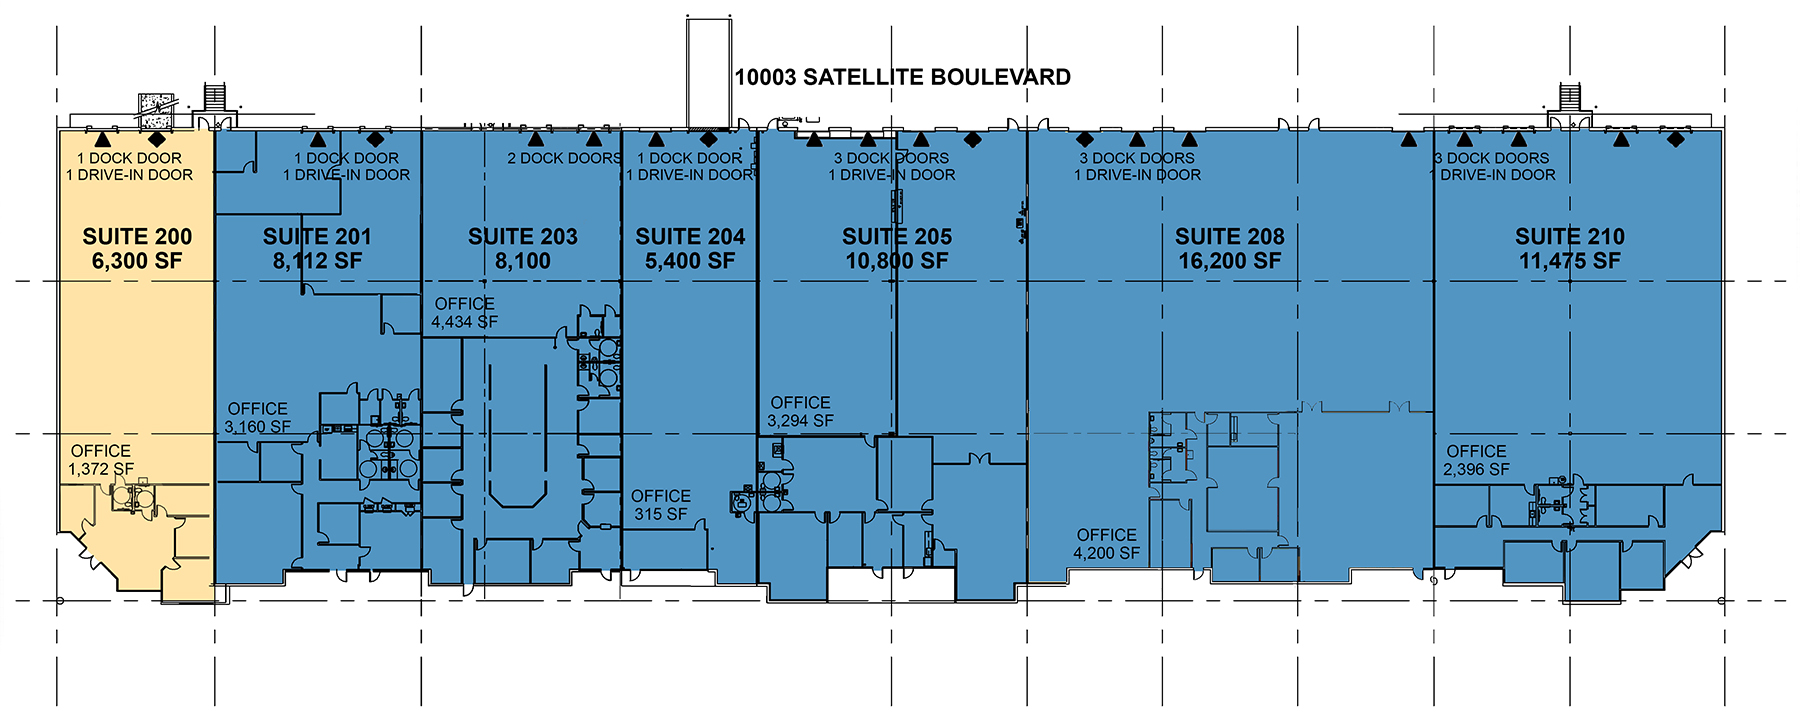 DPM-Prologis-Cypress-Park_10003-Satellite-Blvd_Flyer-Plan.jpg